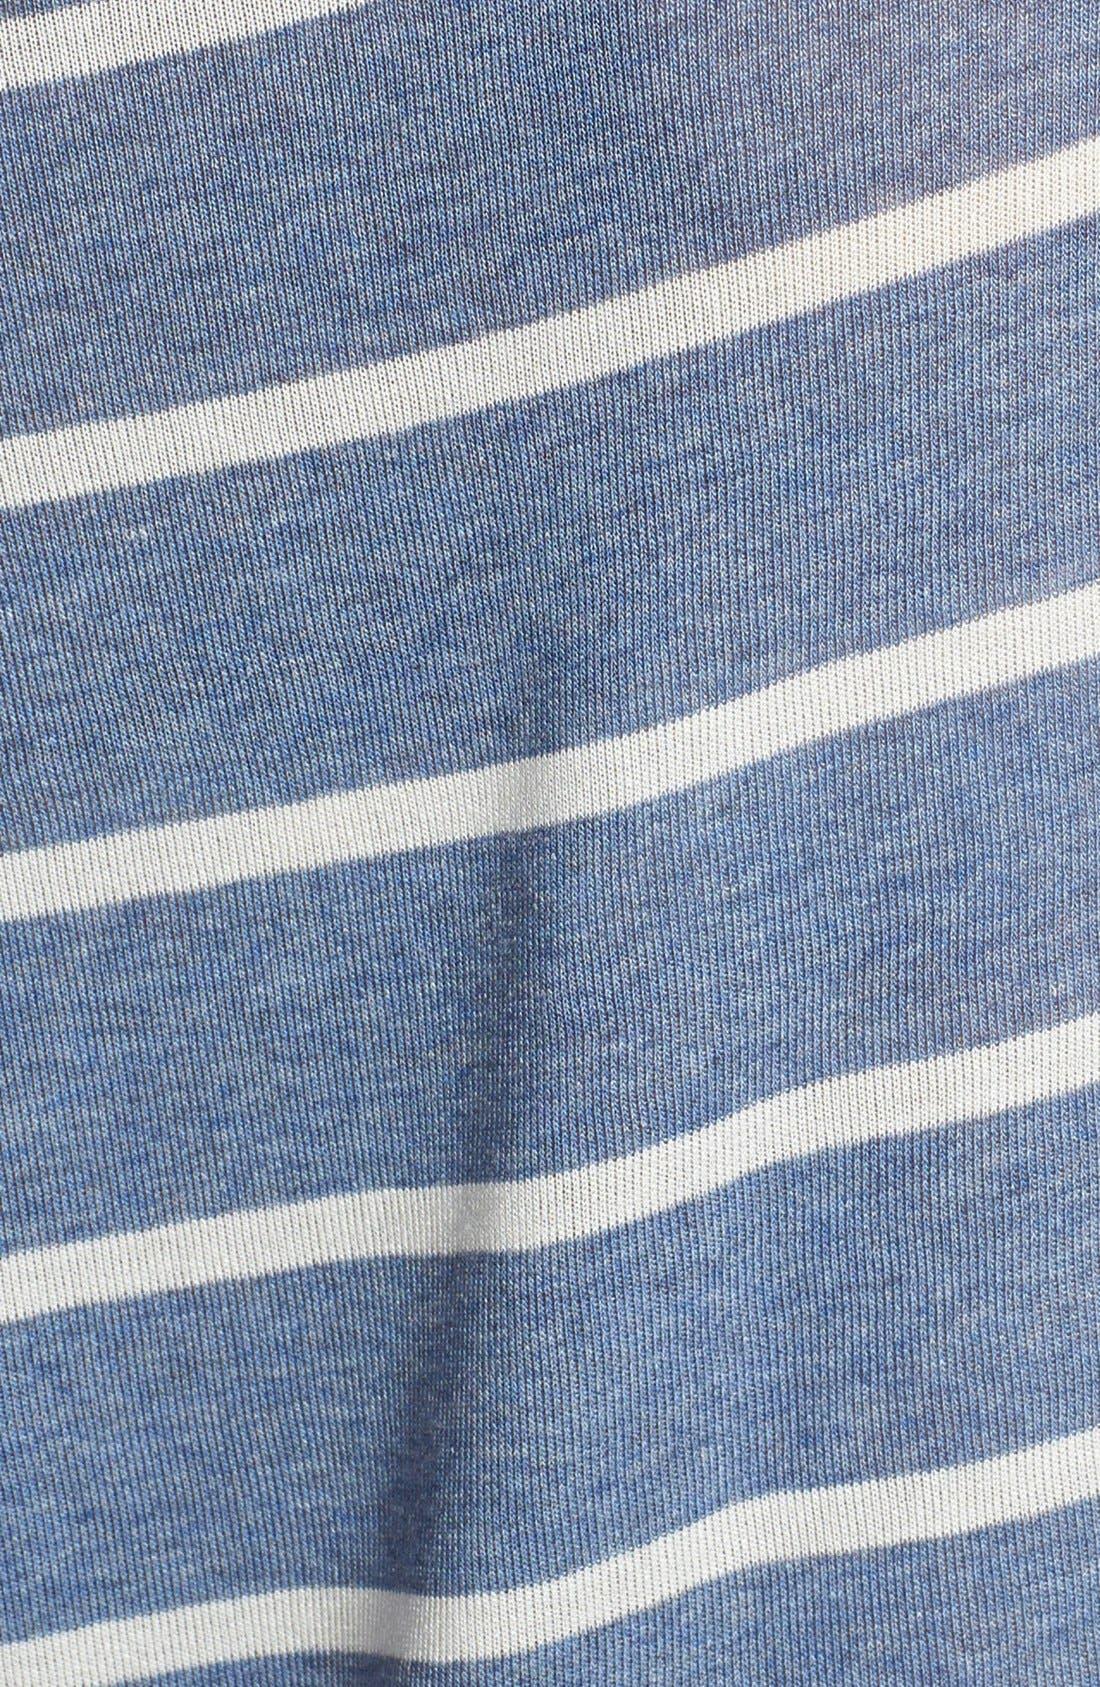 Alternate Image 3  - Splendid Stripe Raglan Sleeve Top